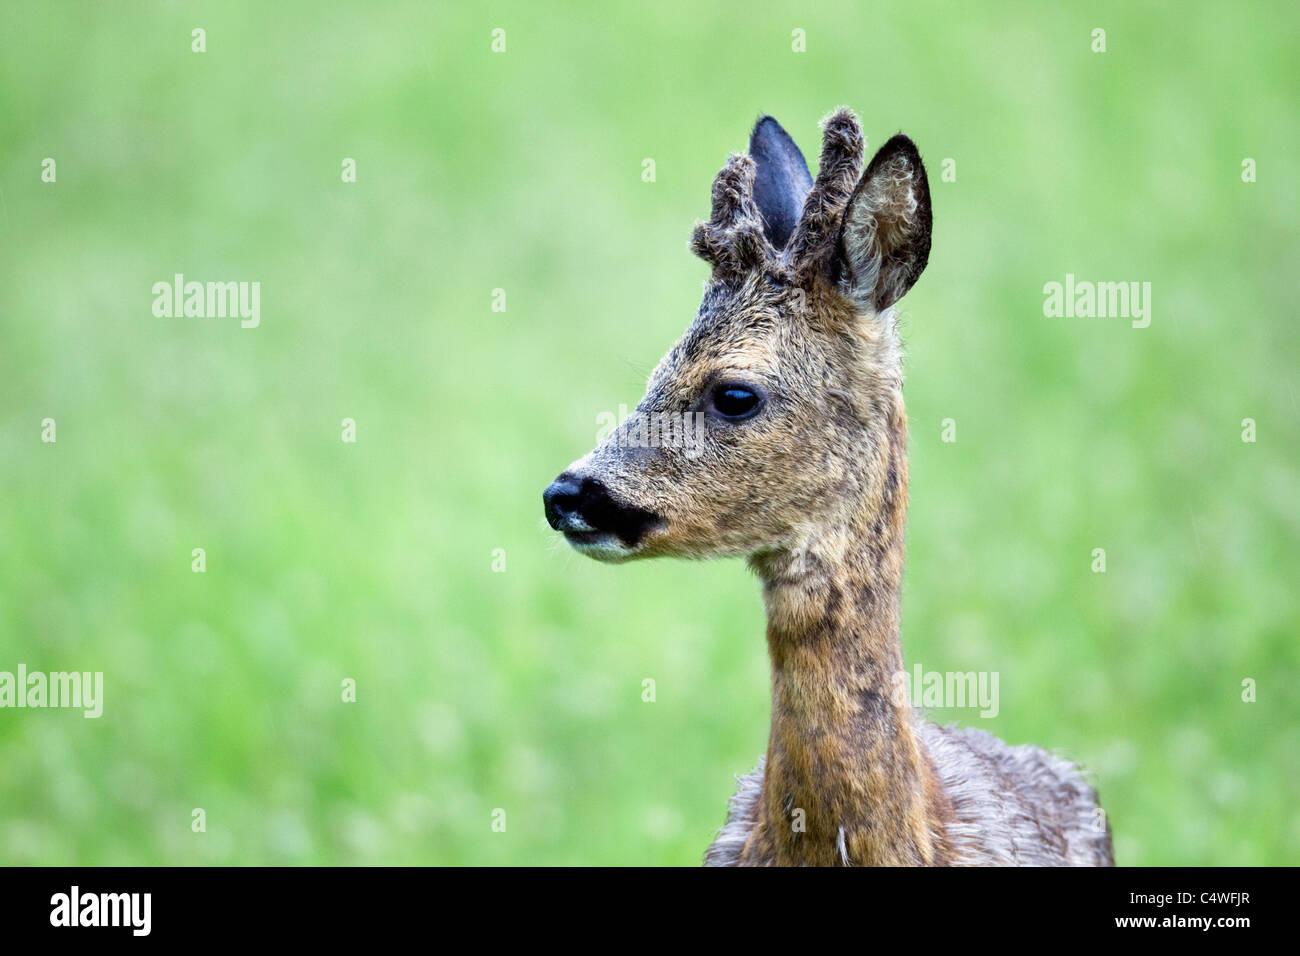 Roe Deer; Capreolus capreolus; Scotland - Stock Image